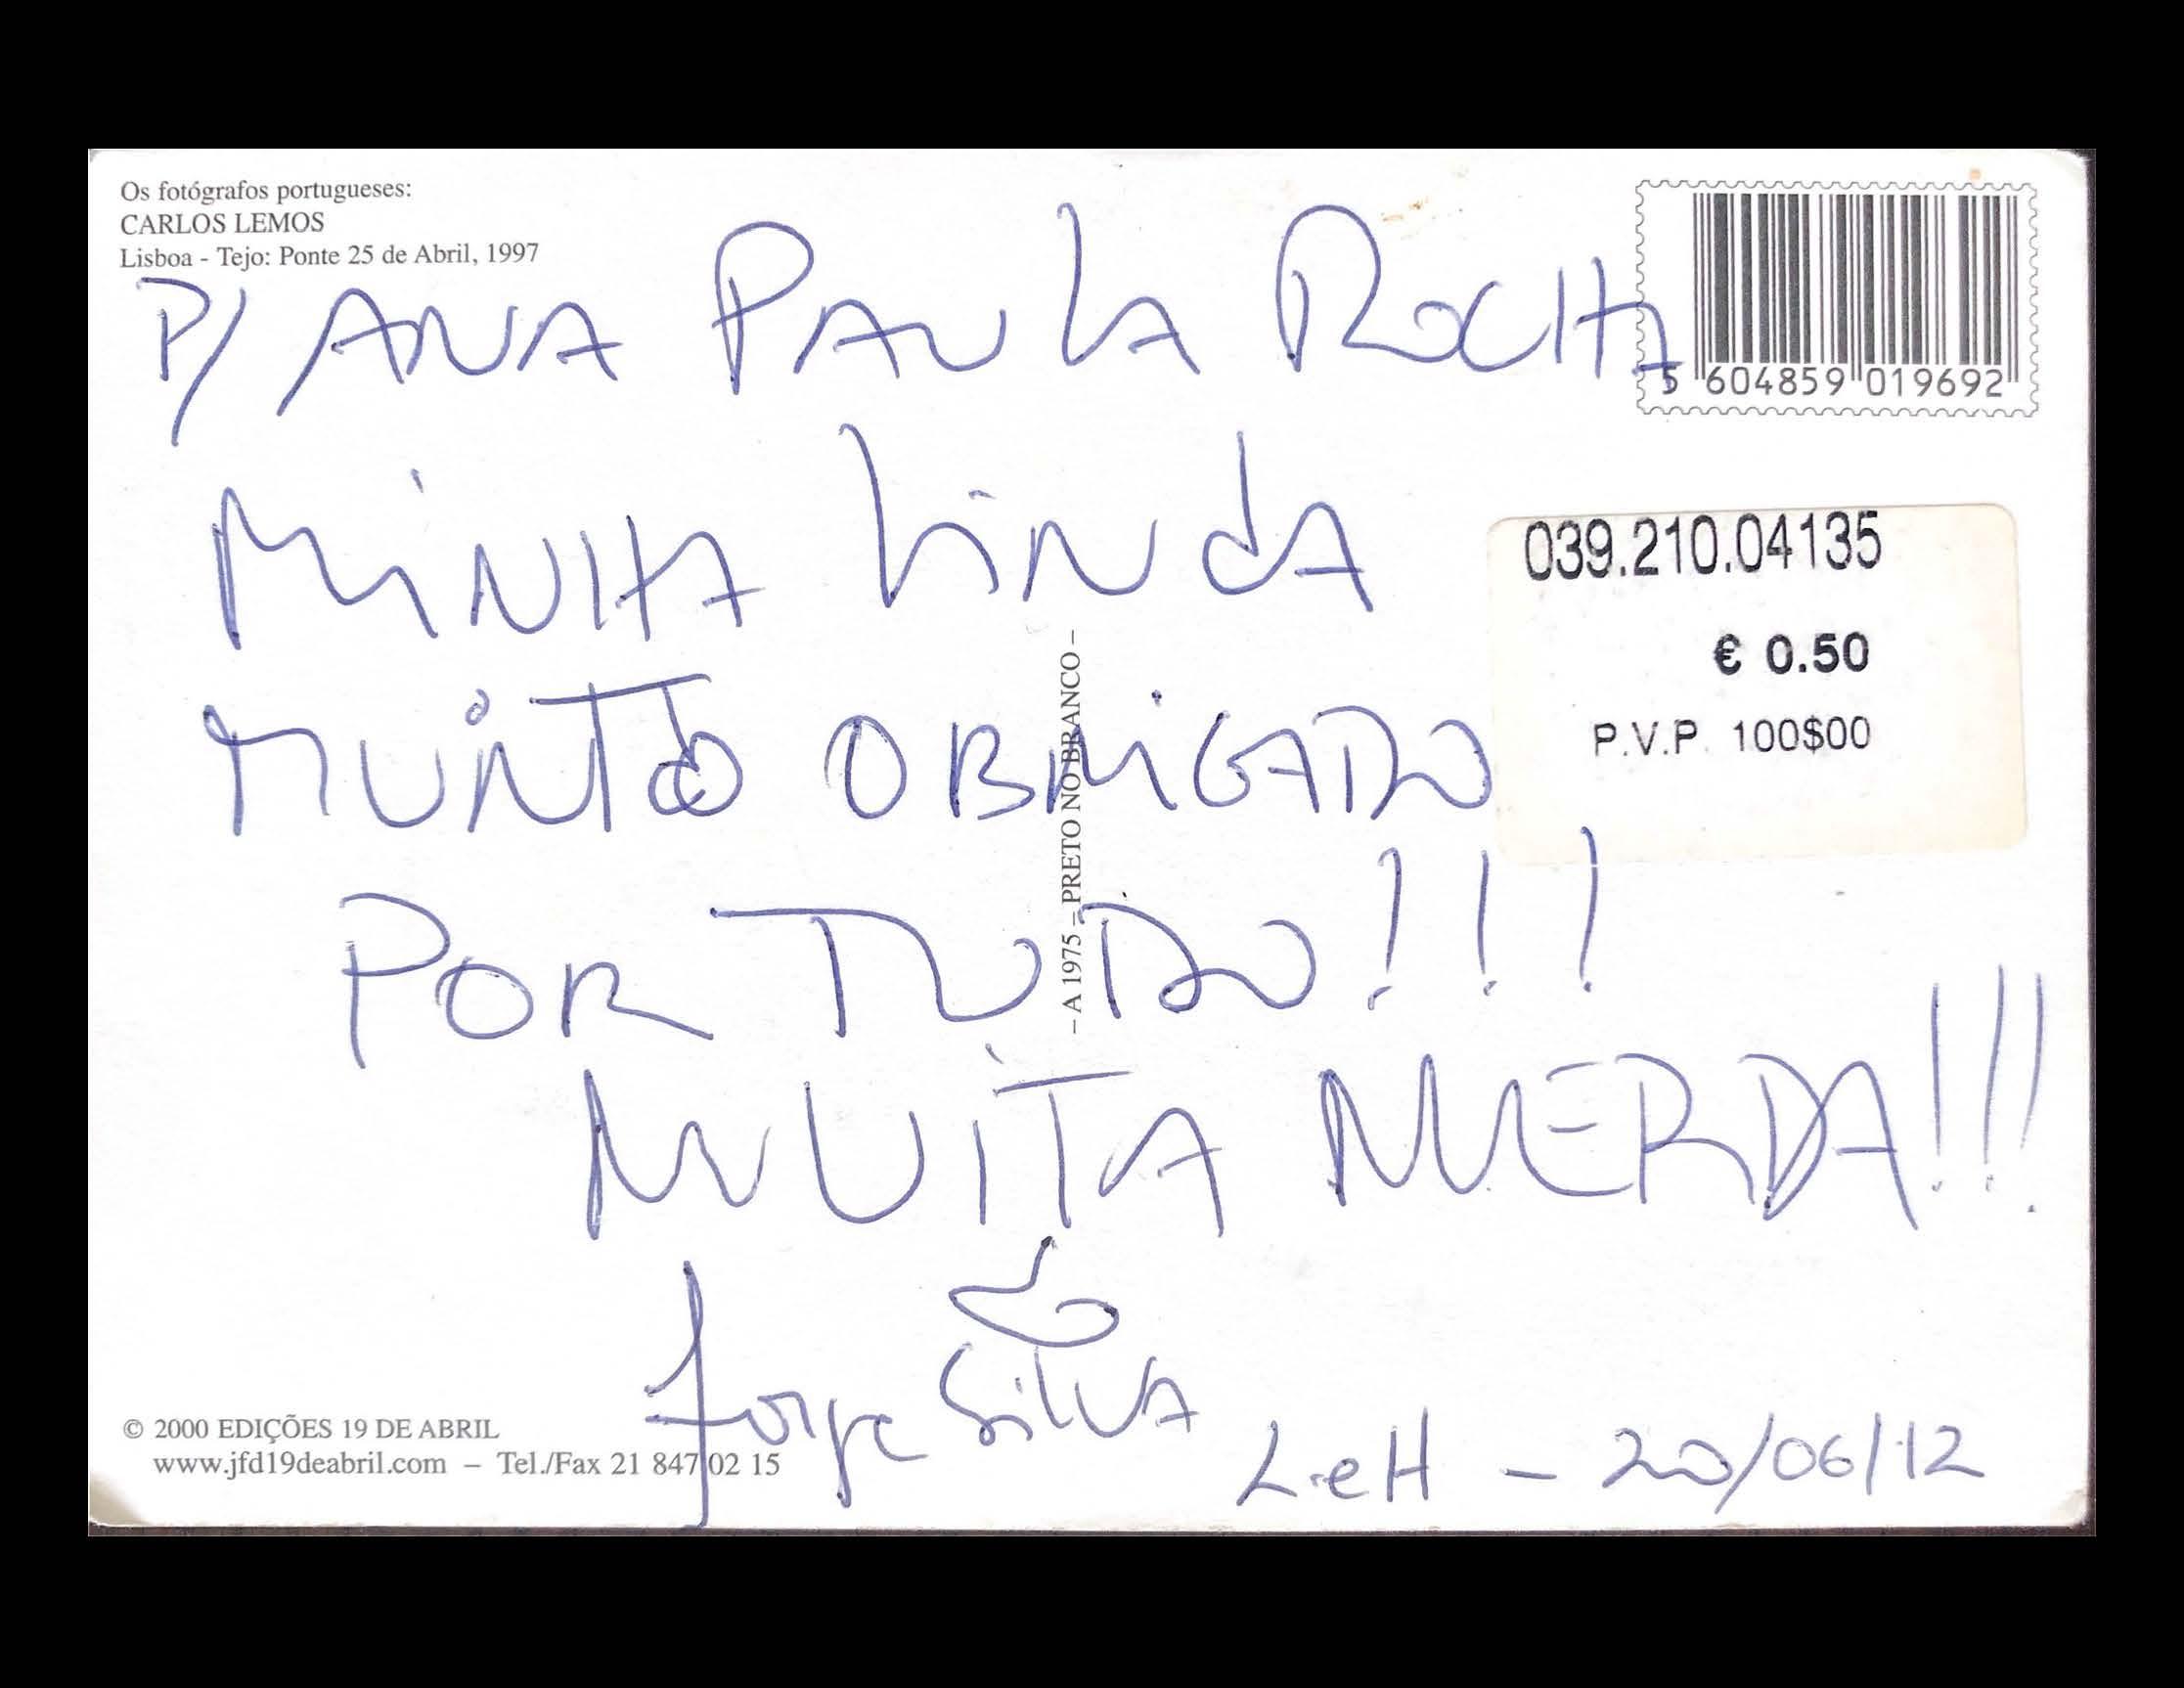 Ana Paula Rocha - Testemunhos - 008